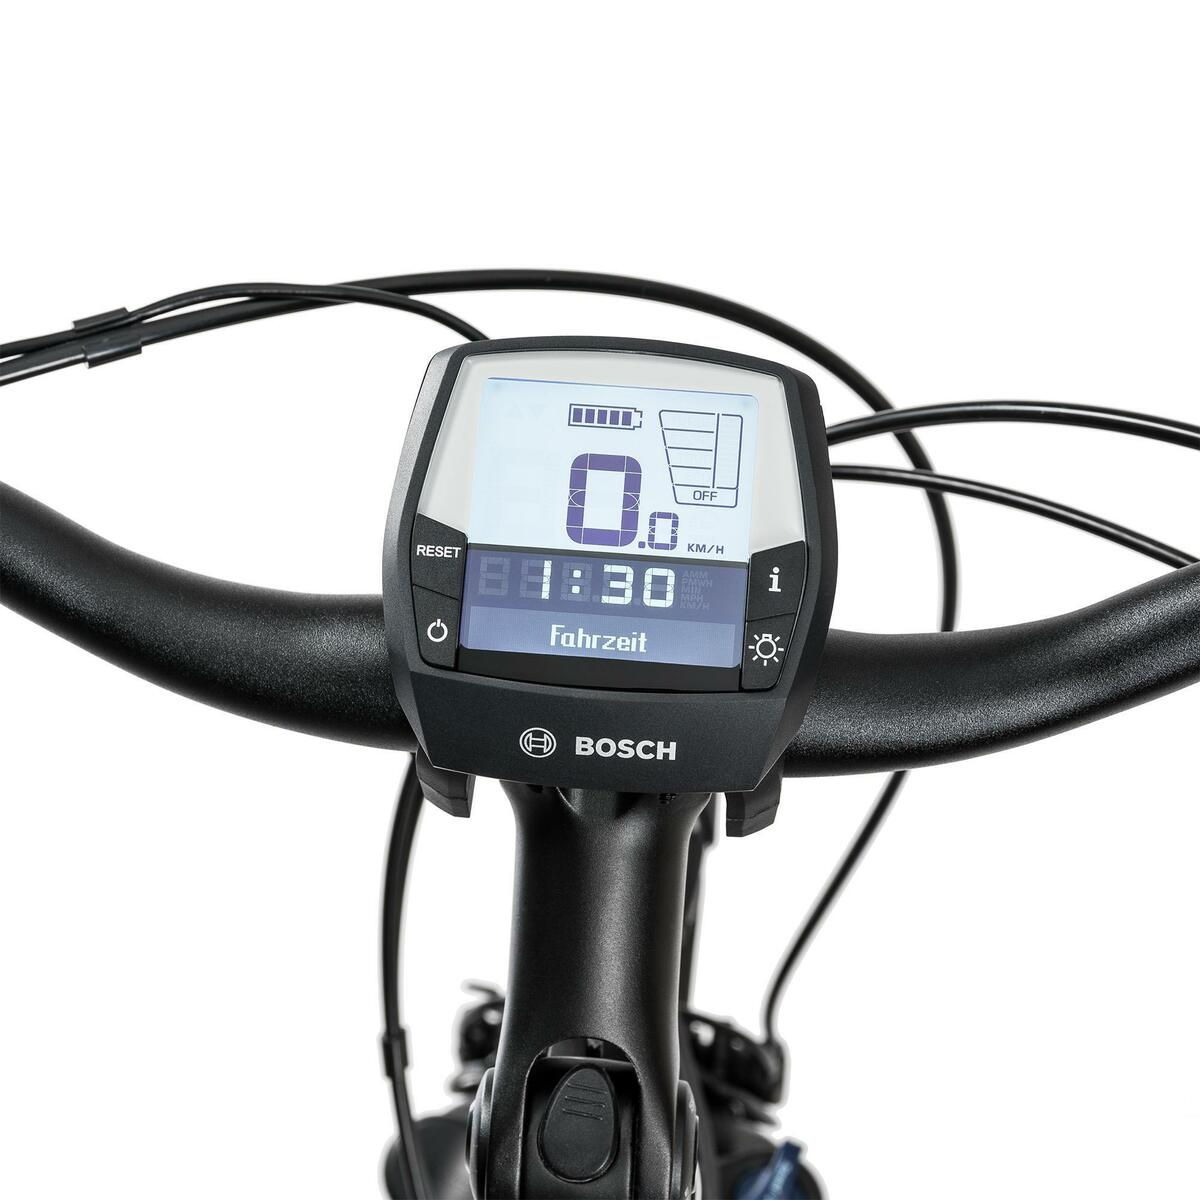 Bild 4 von E-Bike 28 Riverside City XT Performance Cruise 400Wh